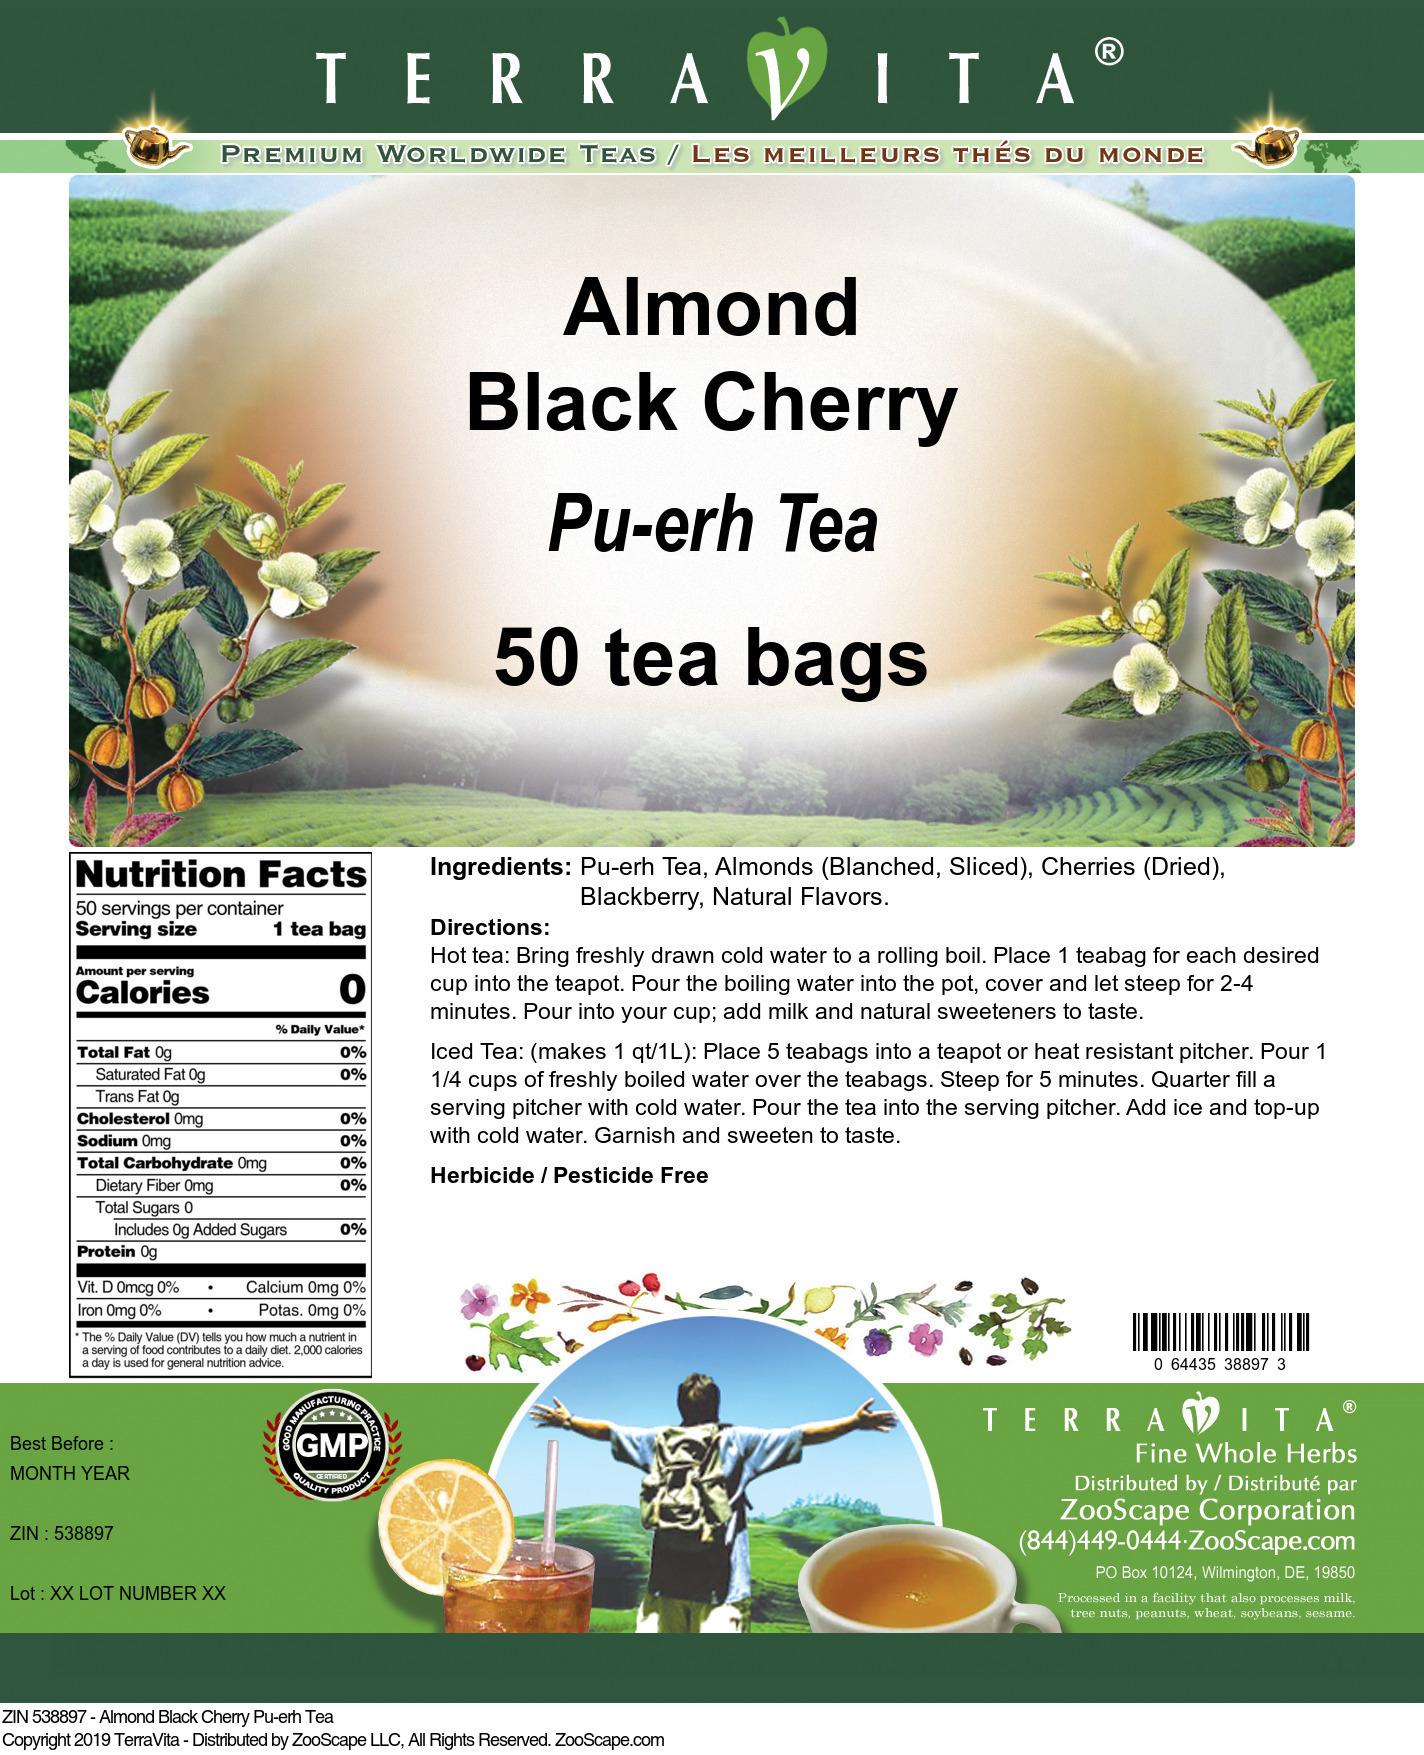 Almond Black Cherry Pu-erh Tea